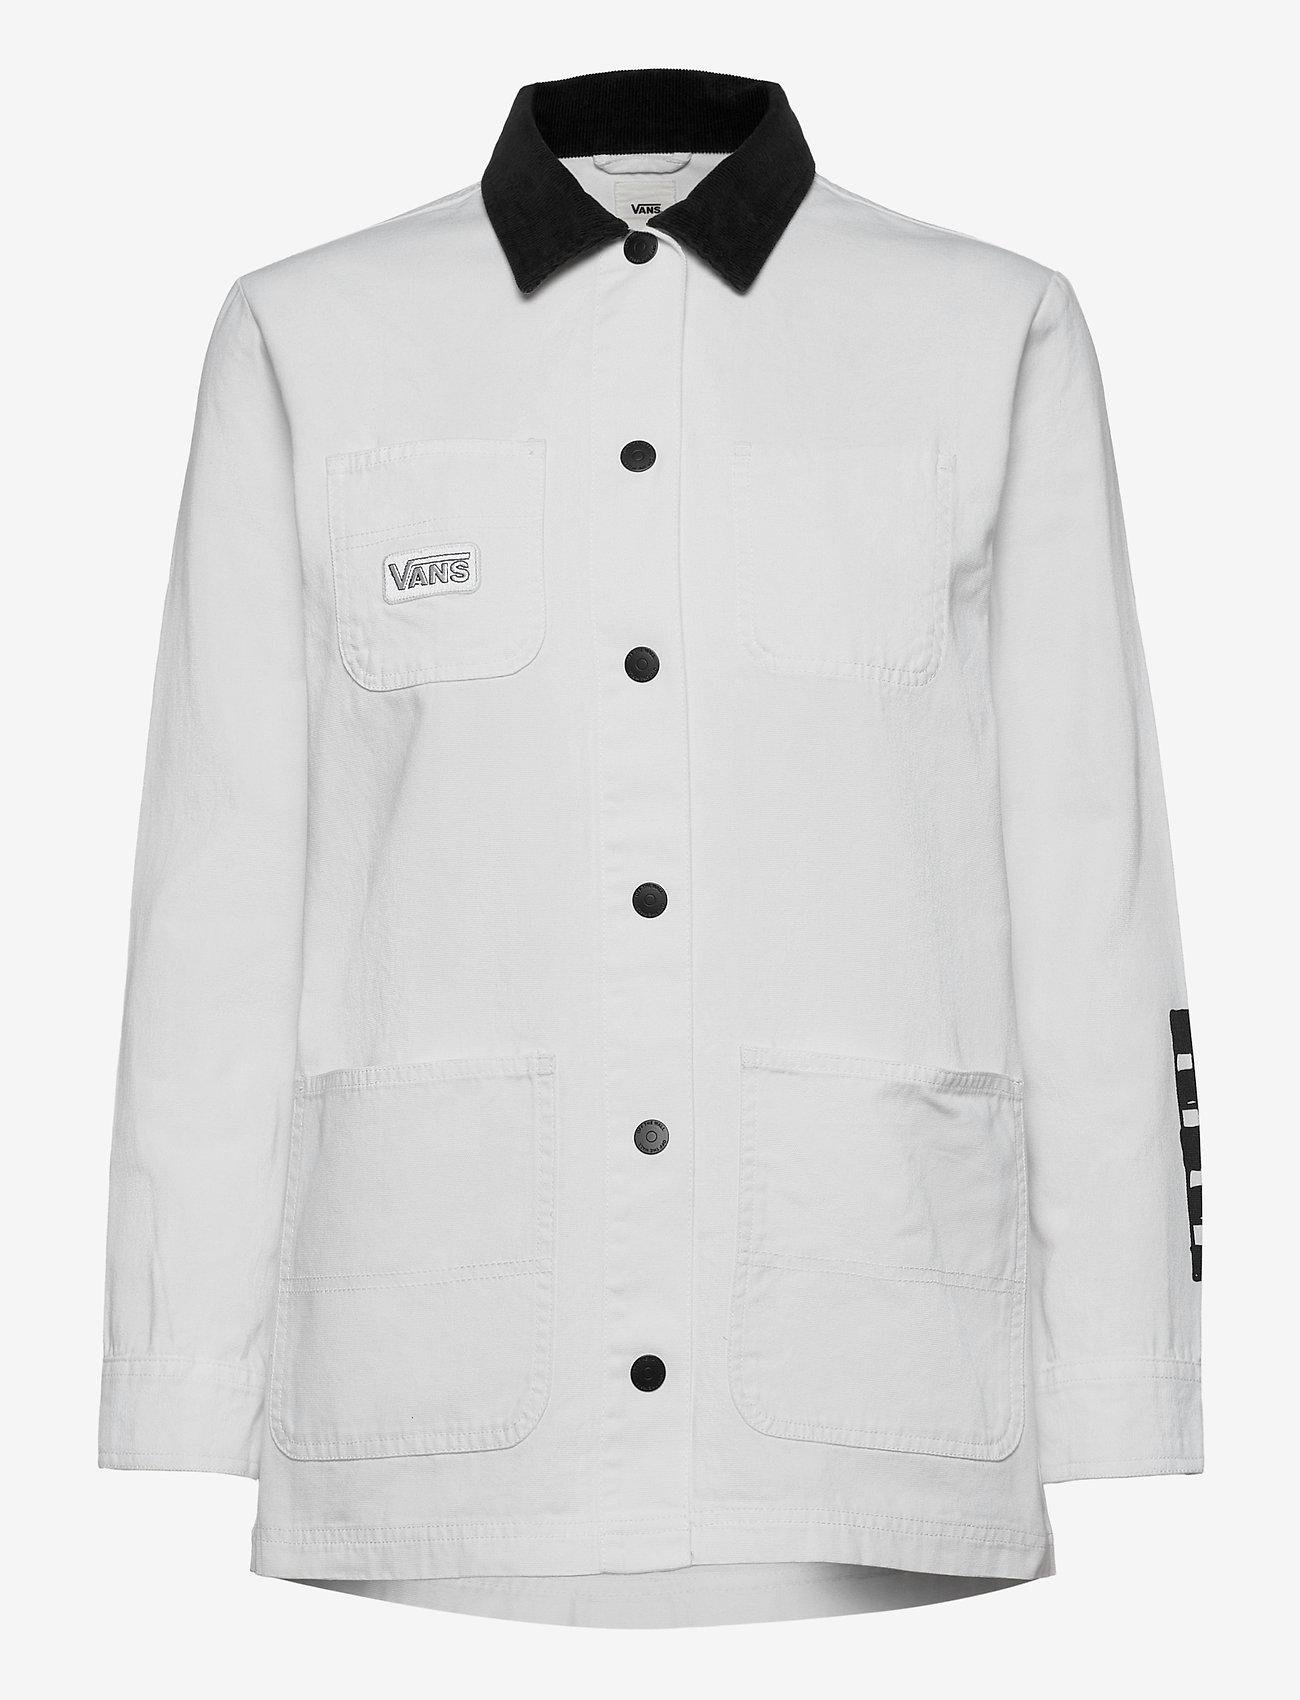 VANS - MAKE ME YOUR OWN DRILL CHORE COAT - sportjassen - white - 0